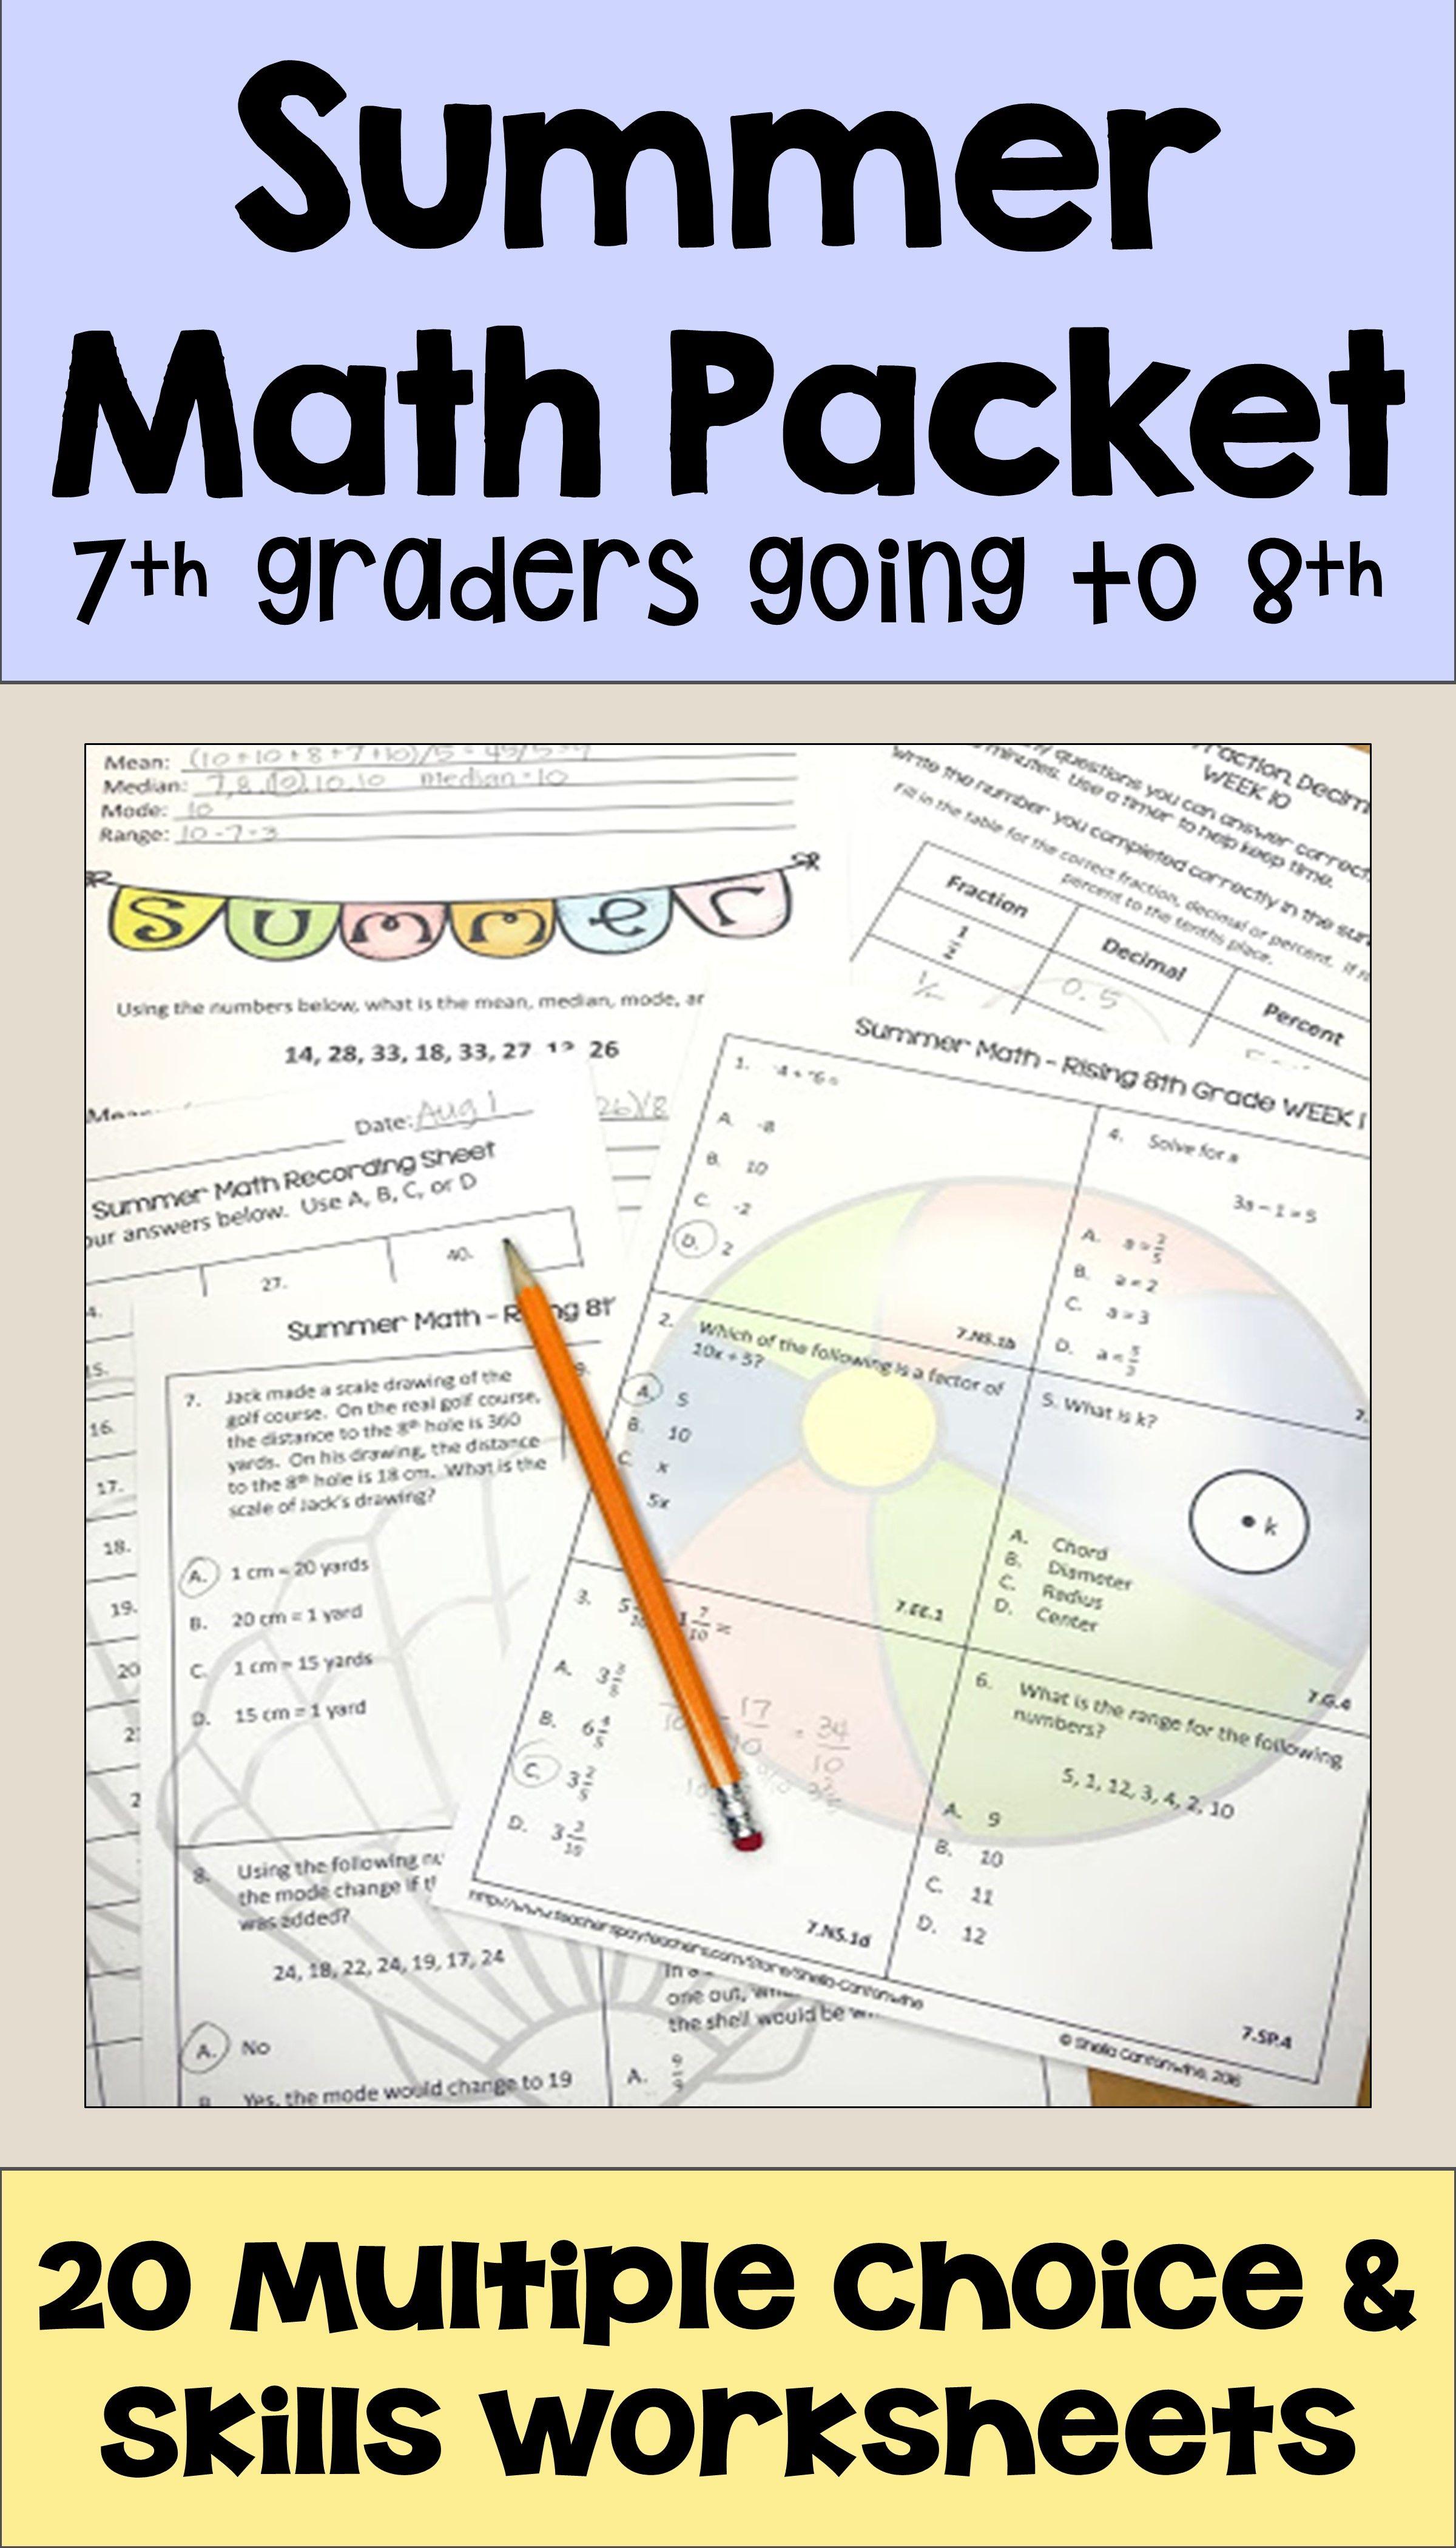 Summer Math Packet For Rising 8th Graders Review Of 7th Grade Math Summer Math Packet Summer Math Math Packets [ 4200 x 2400 Pixel ]